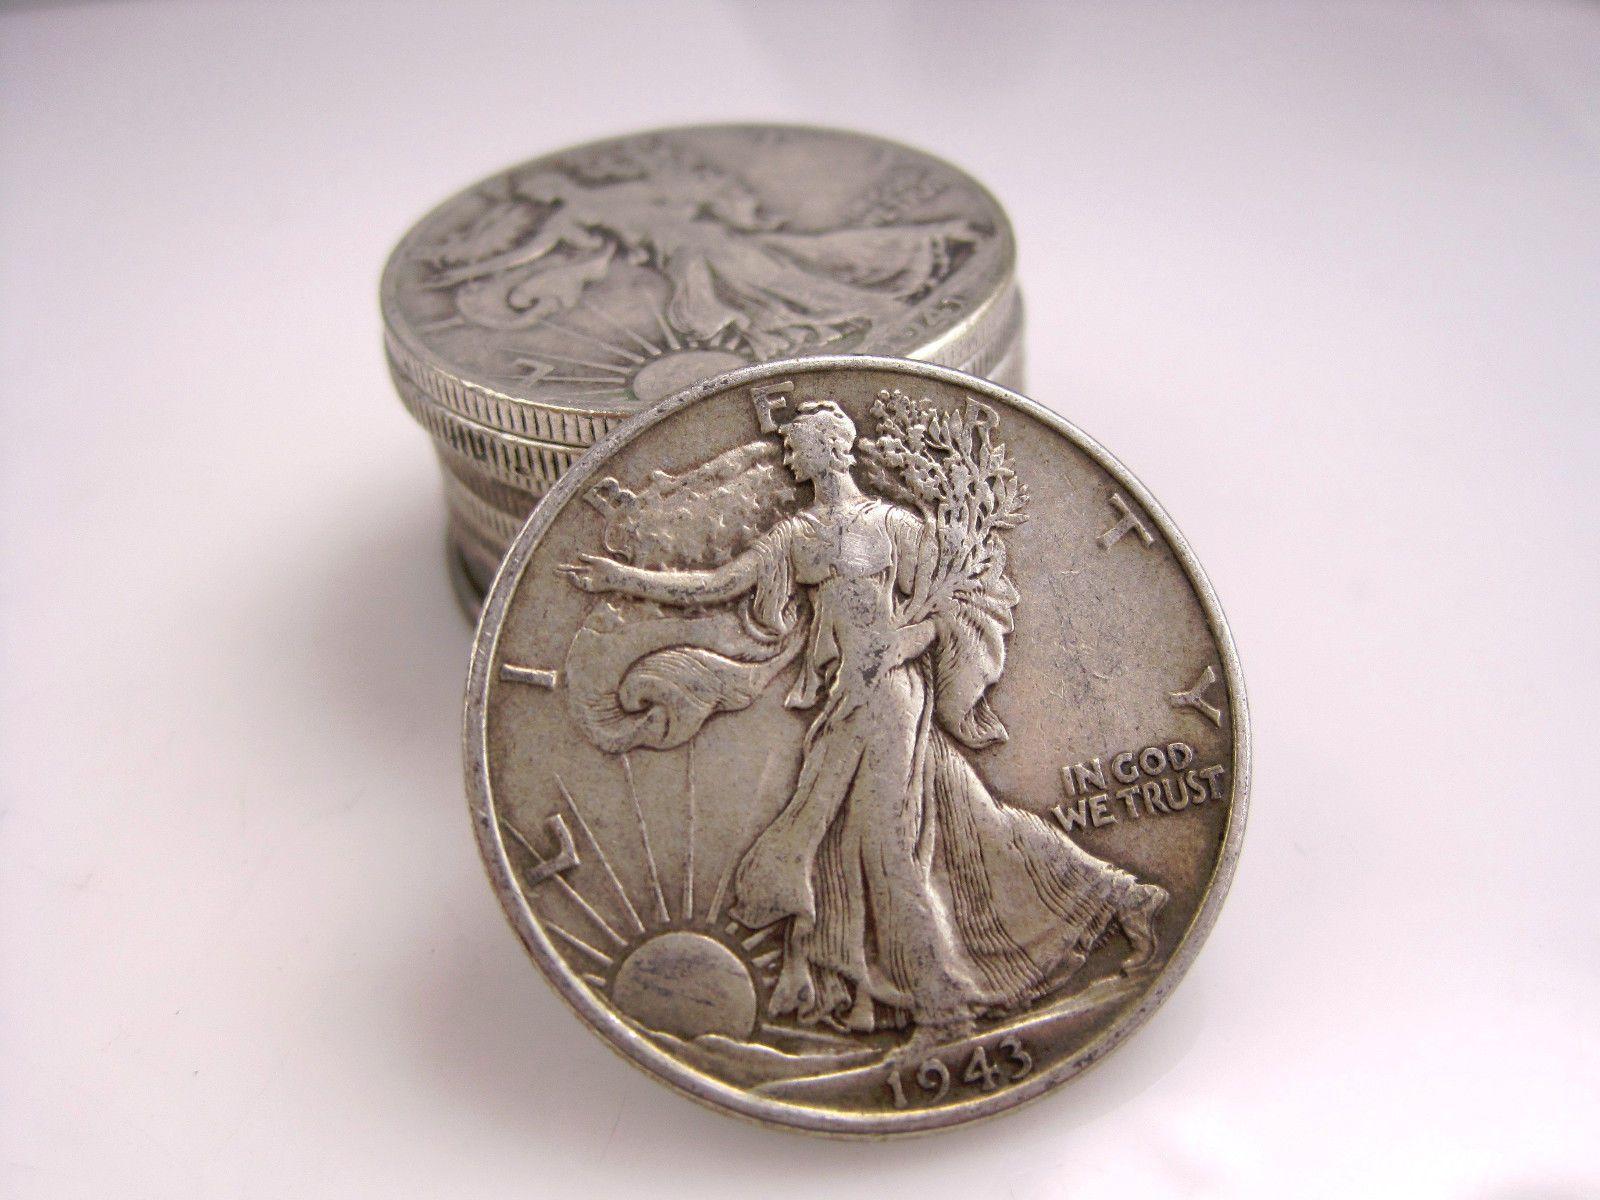 Lot of 10 Walking Liberty Half Dollar Coins Mixed Dates Free S/H #6234 https://t.co/n79KewsiHR https://t.co/G8GP14wRG2